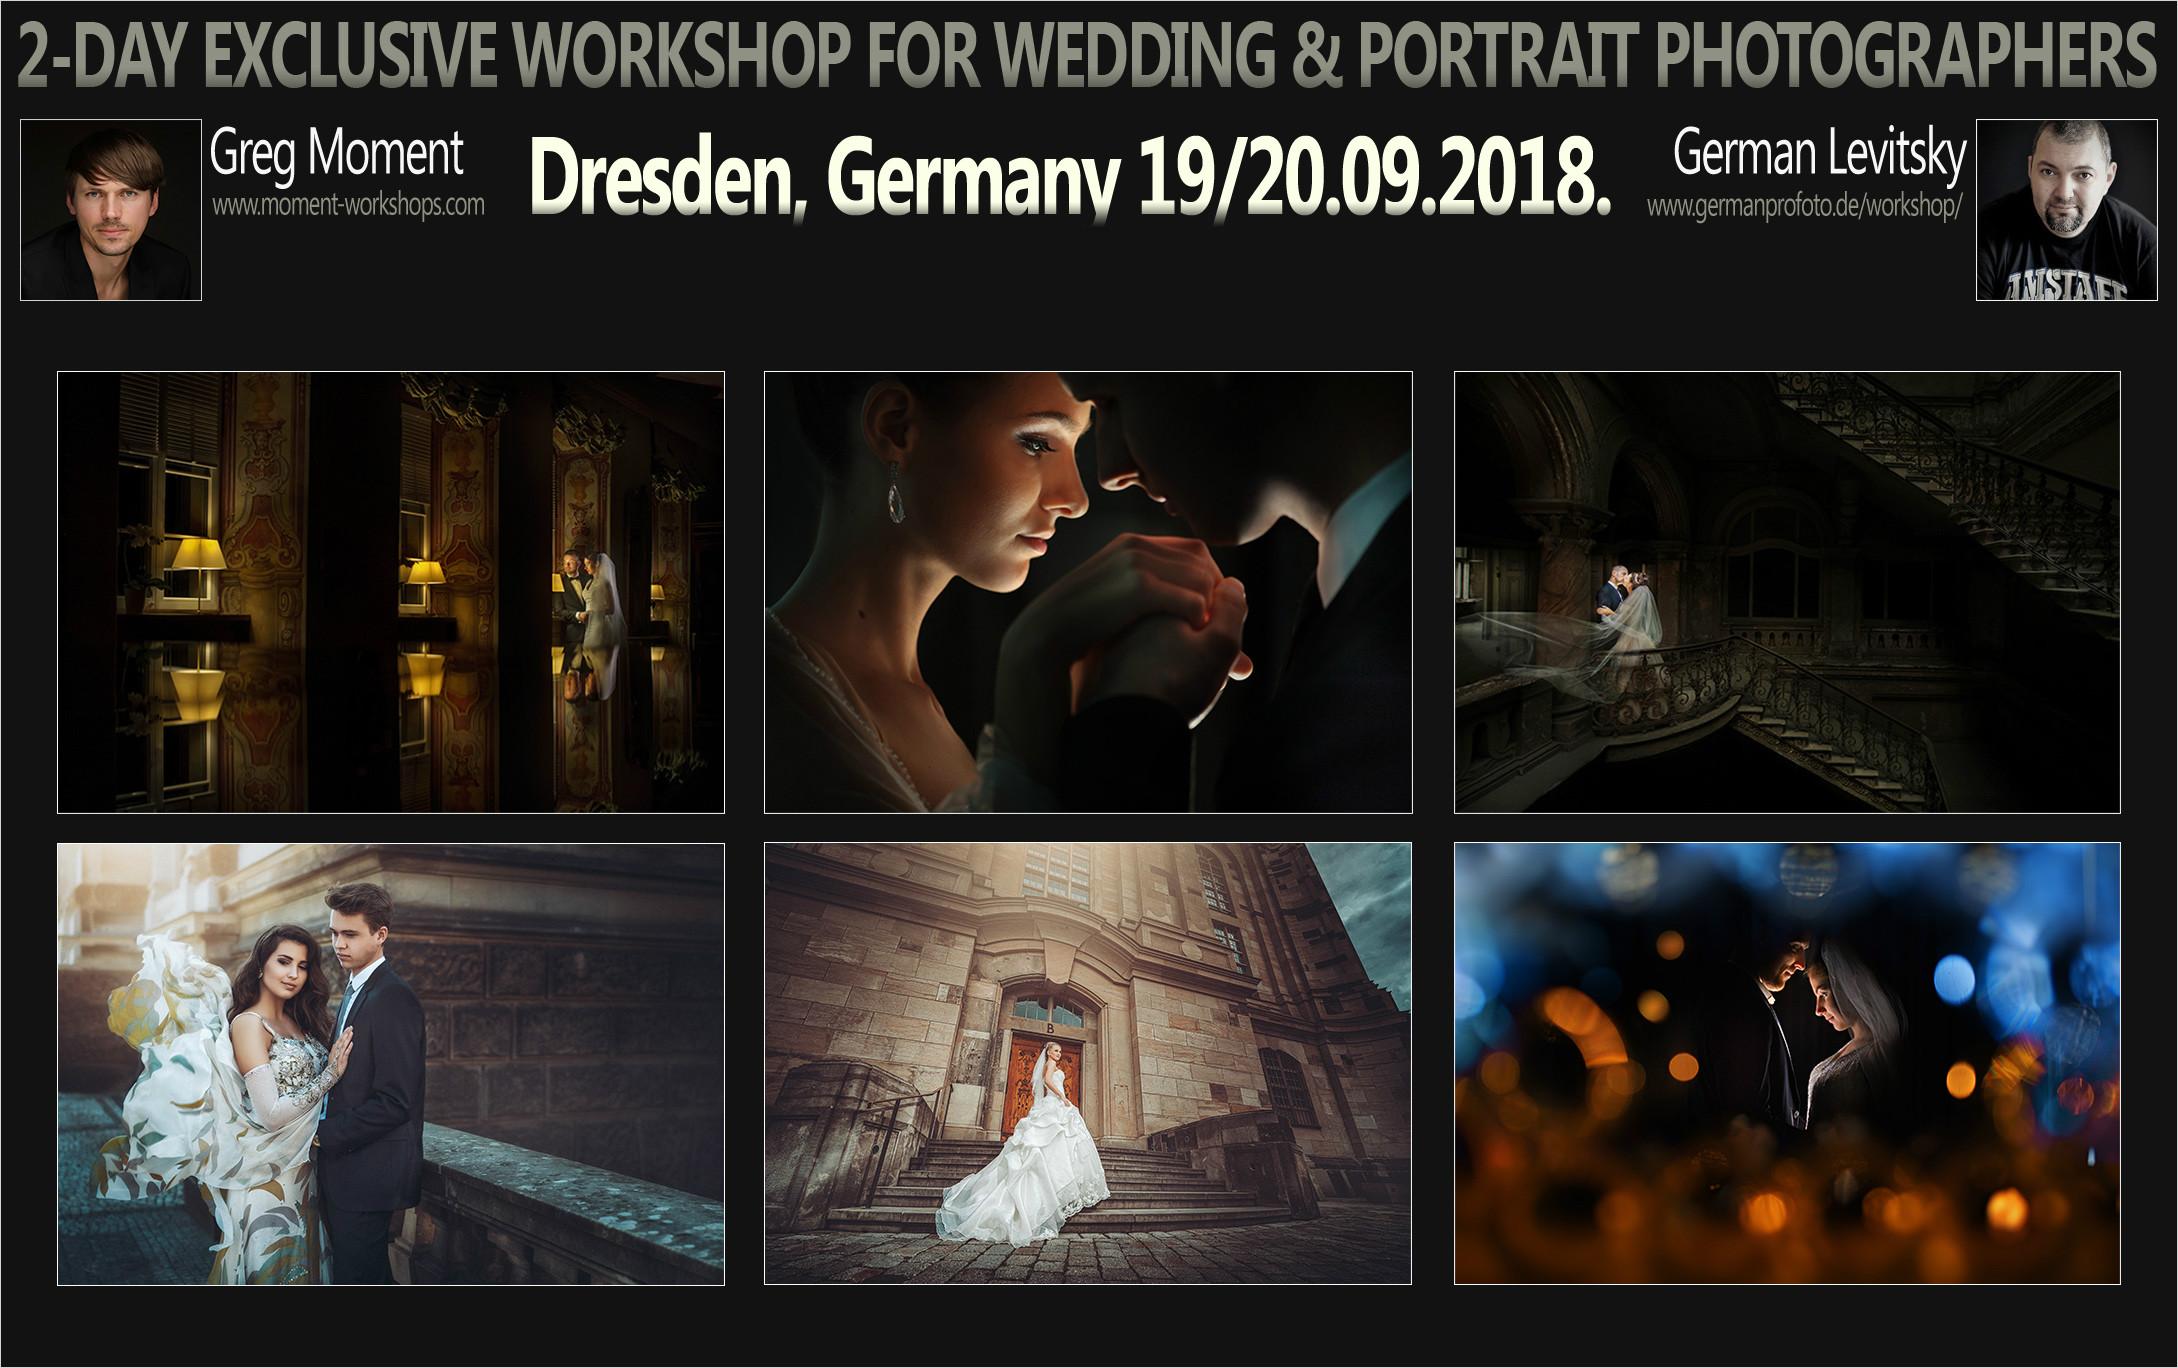 Dresden, Germany - 19/20.09.2018. with German Levitsky